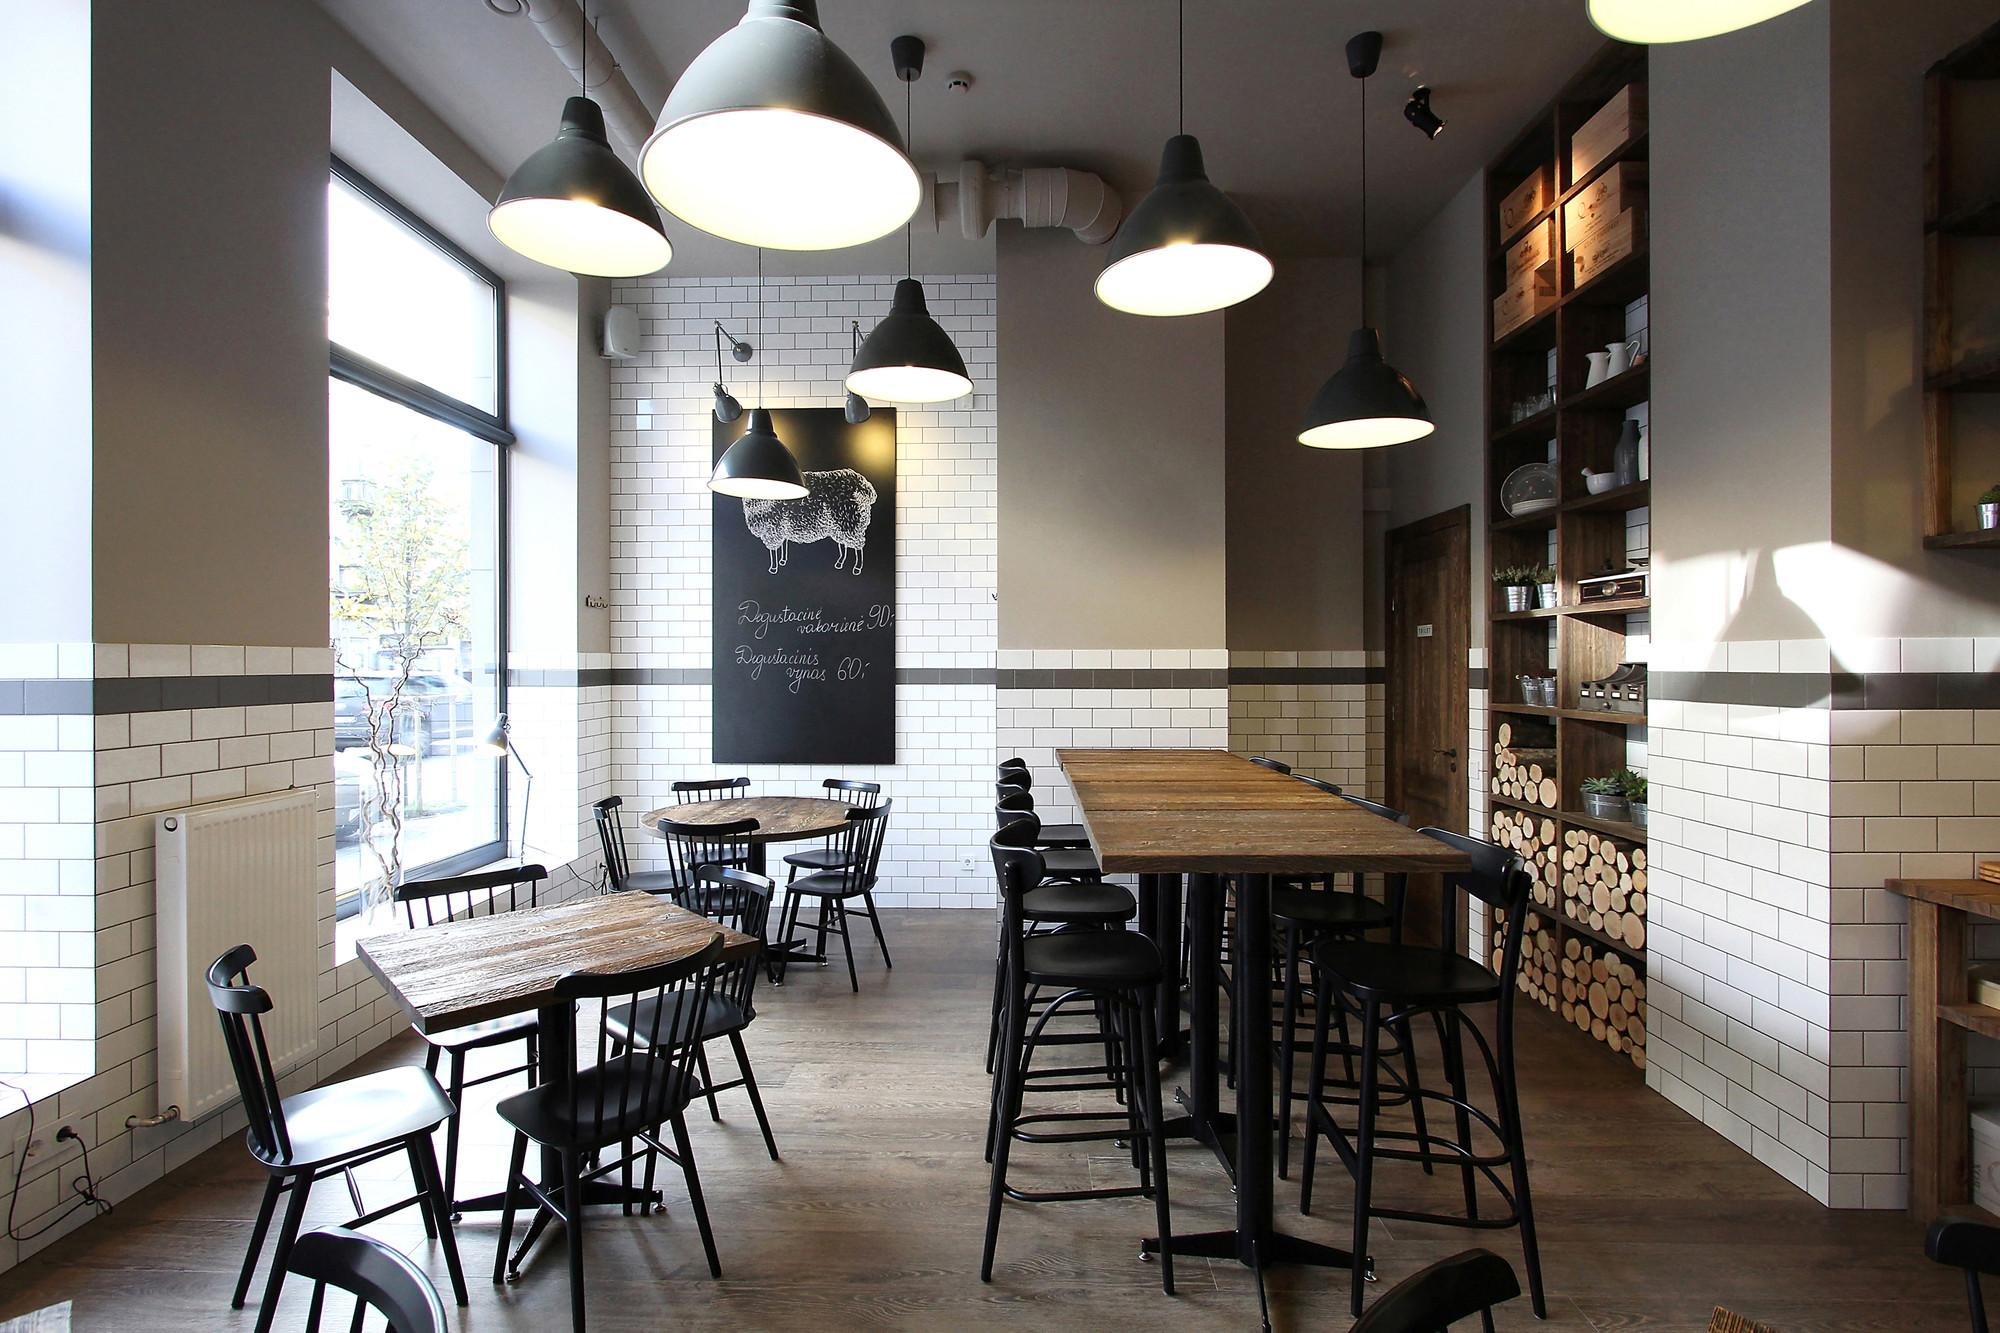 industrial style restaurant furniture. Industrial Style Restaurant Furniture. Courtesy Of Ramūnas Manikas Furniture